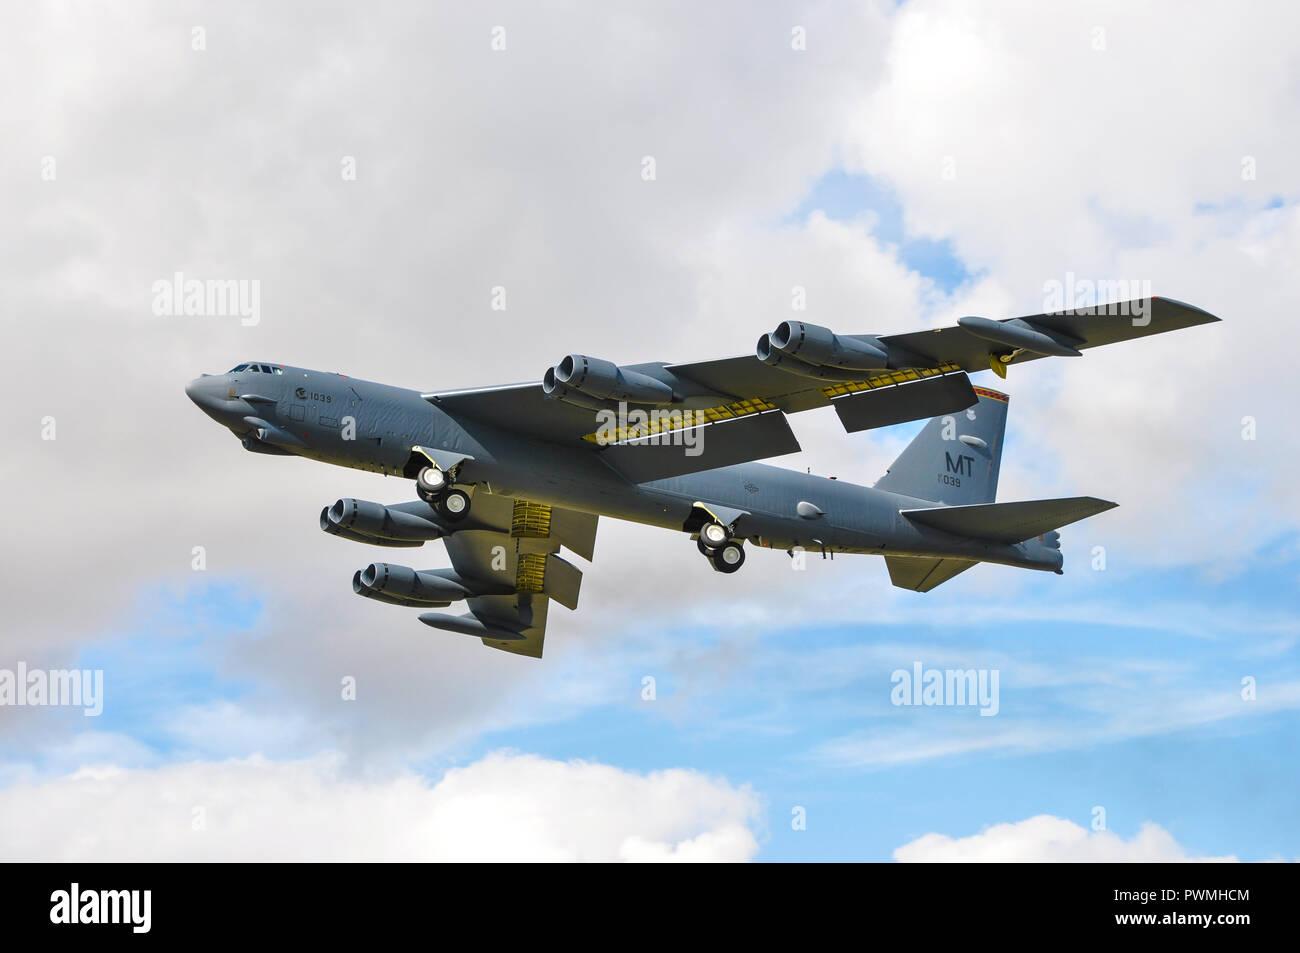 boeing-b-52-stratofortress-jet-long-range-nuclear-strategic-bomber-plane-of-united-states-air-force-usaf-air-force-global-strike-command-landing-PWMHCM.jpg